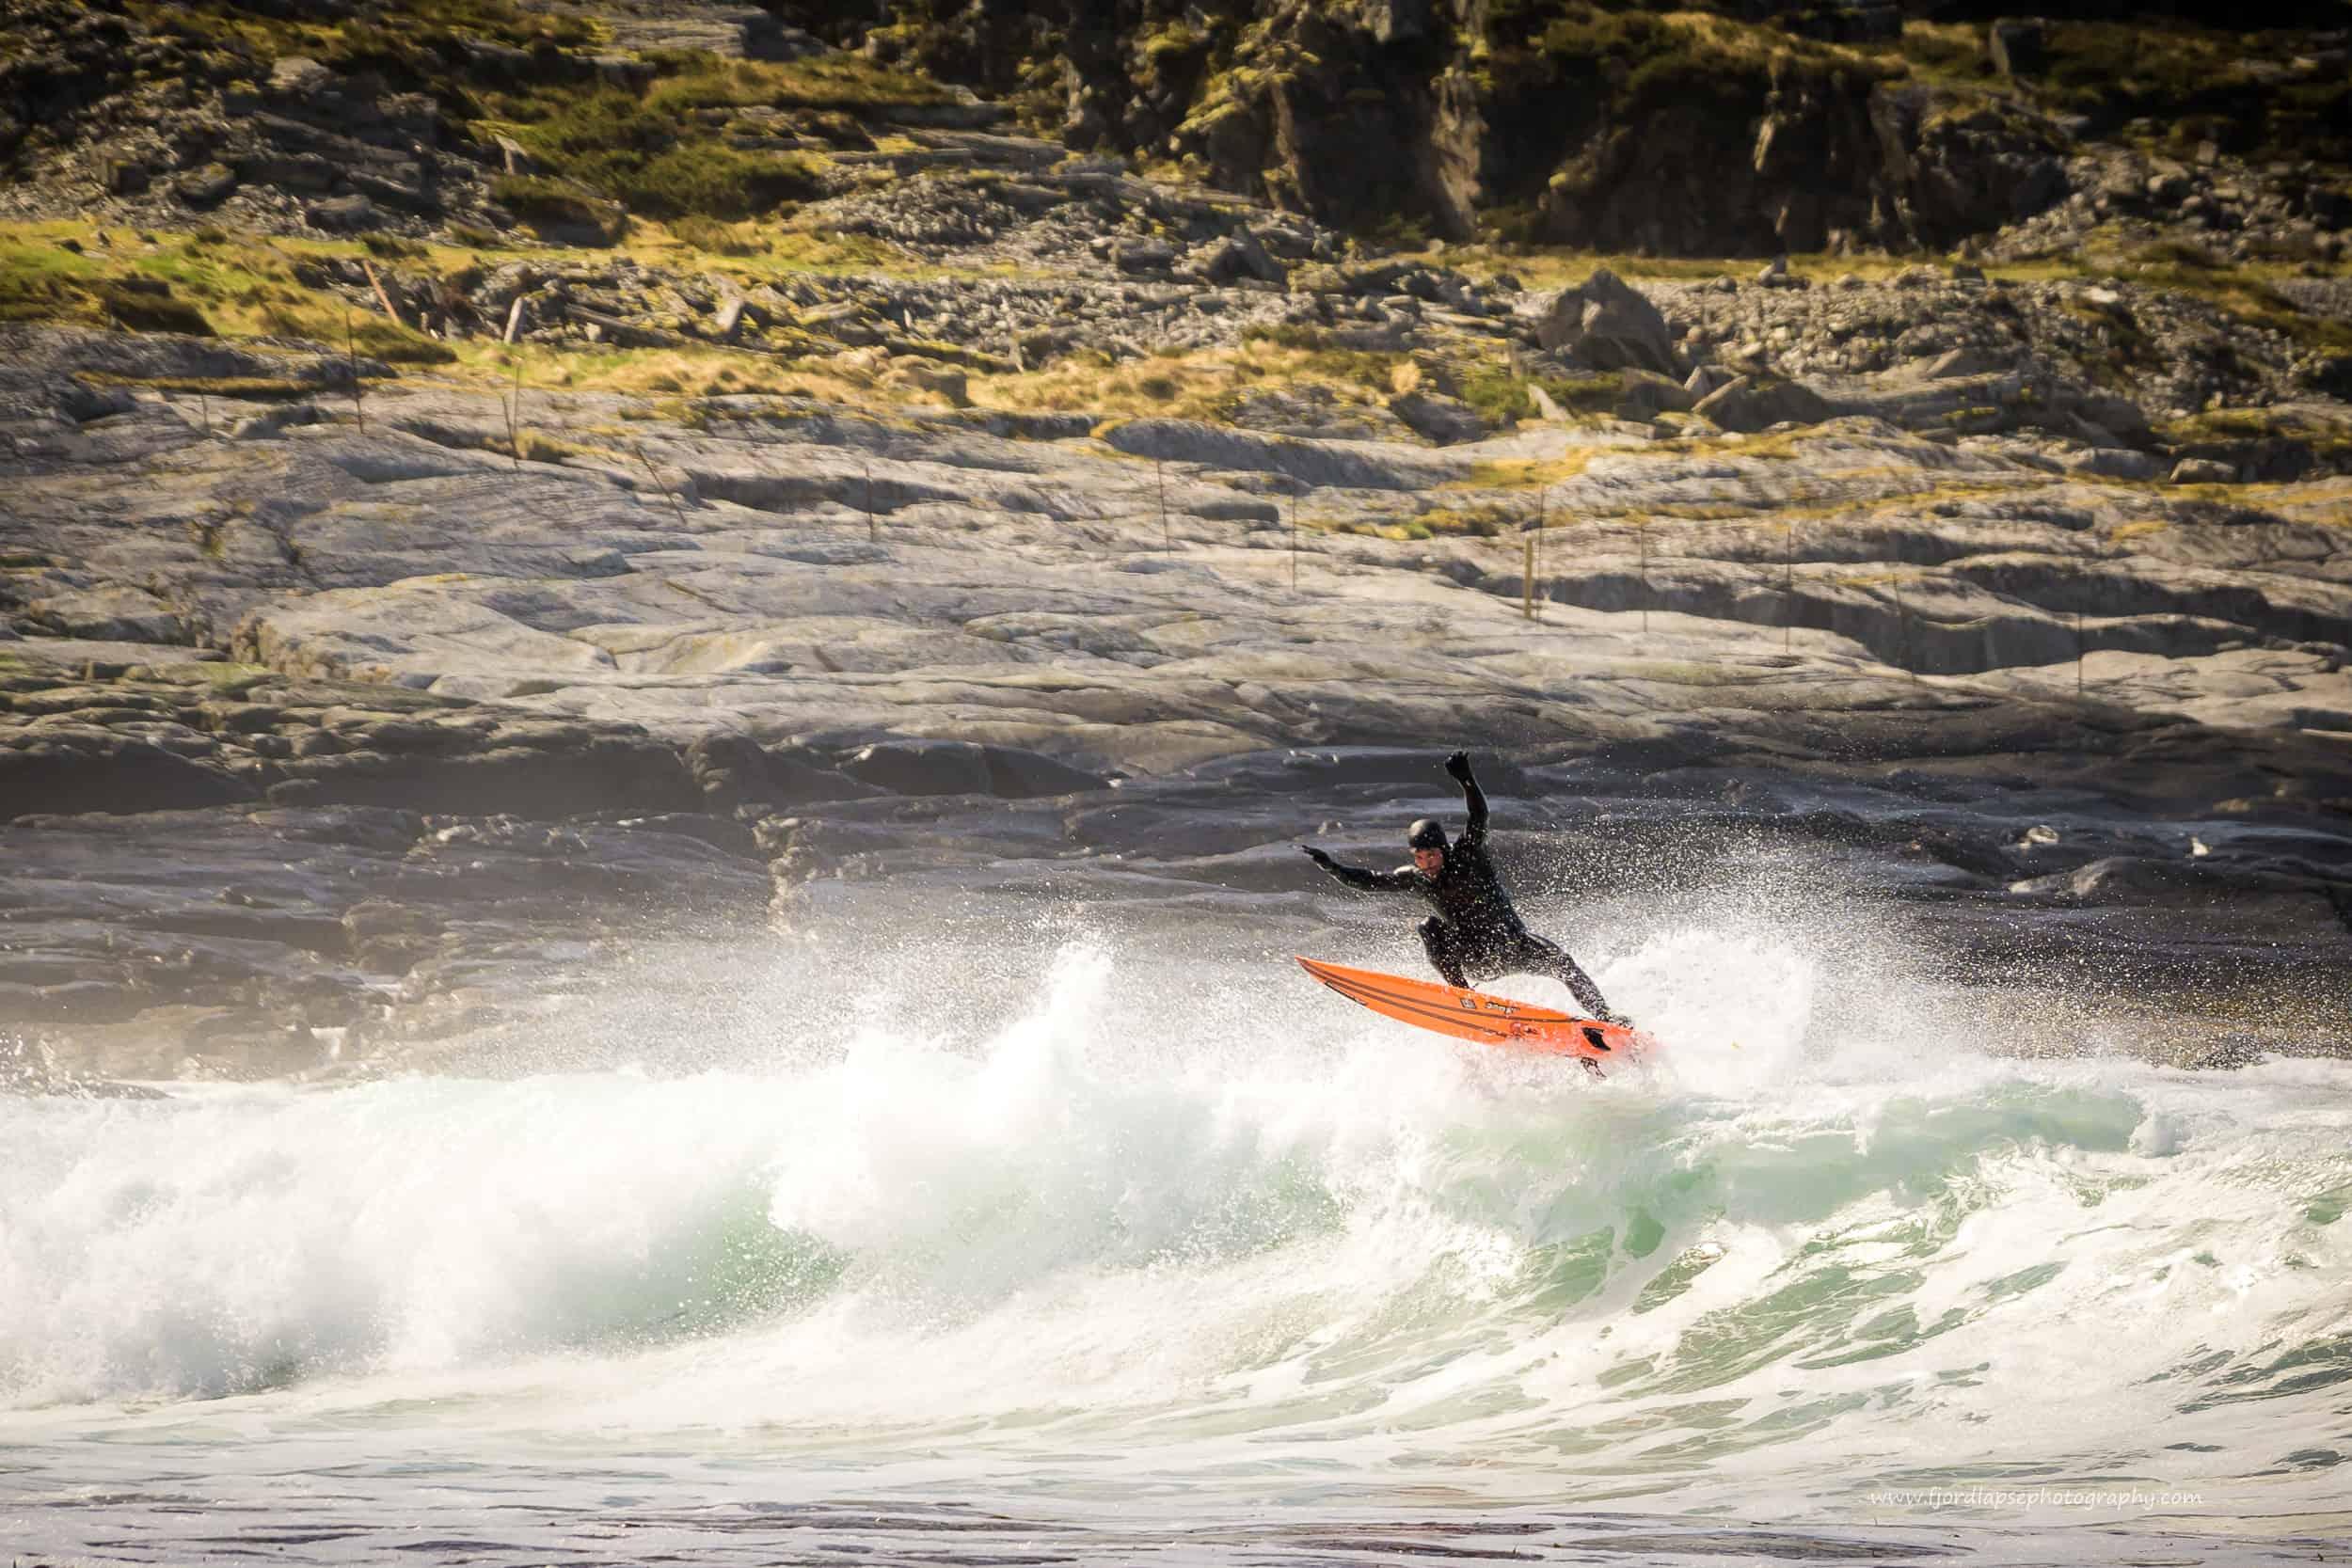 Seamus Fox surfer